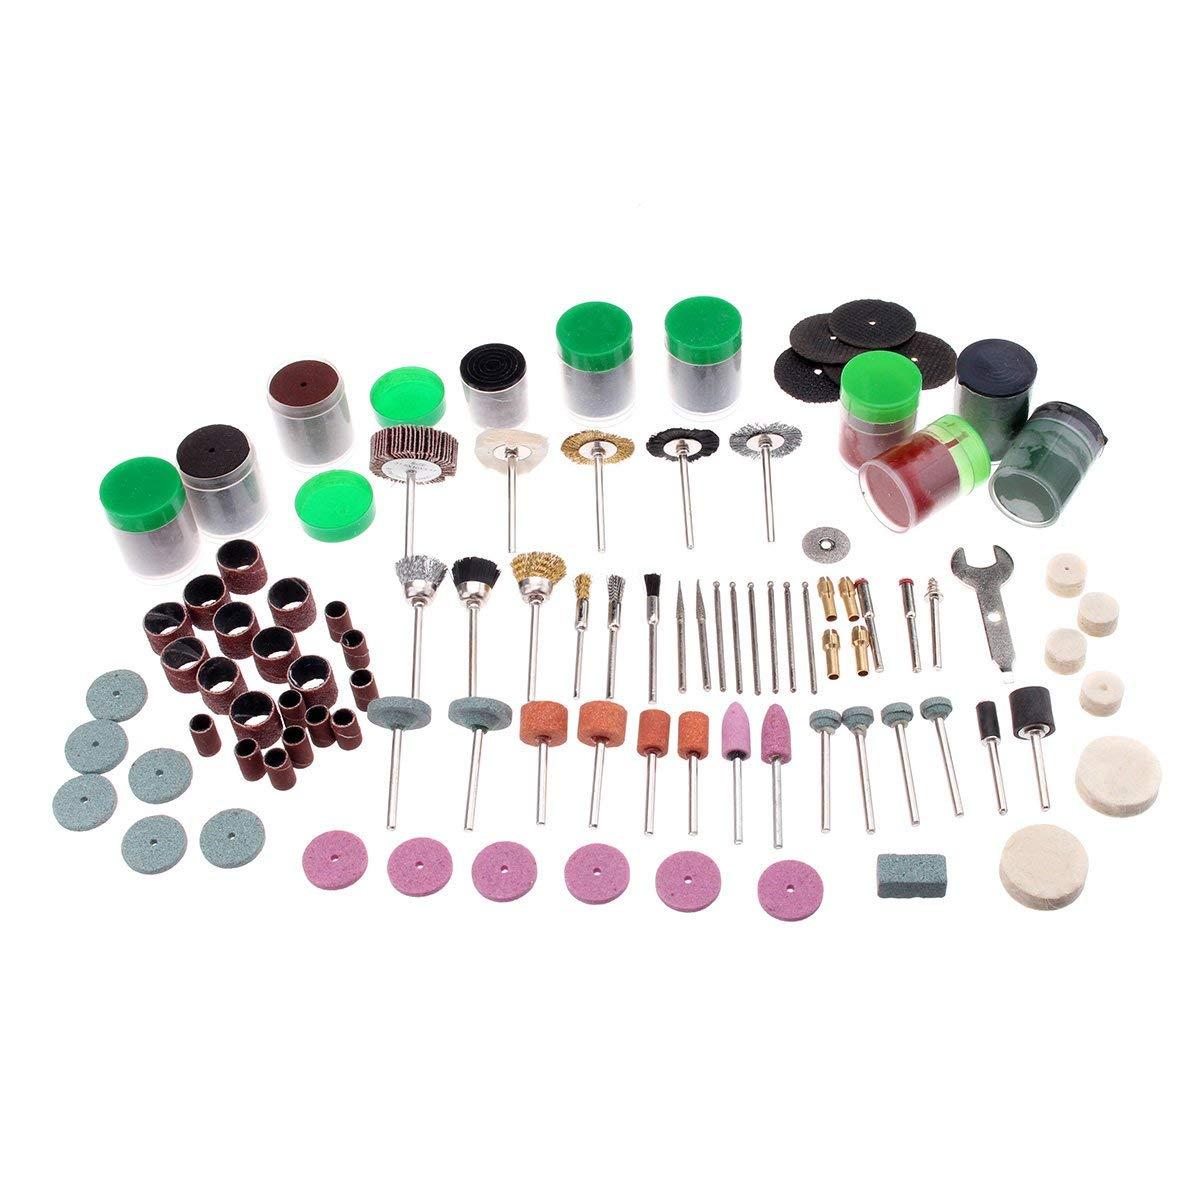 Letbo New 161pcs Mini Drill Multi Rotary Tool Accessories Set Grinding Polishing Kits for Dremel